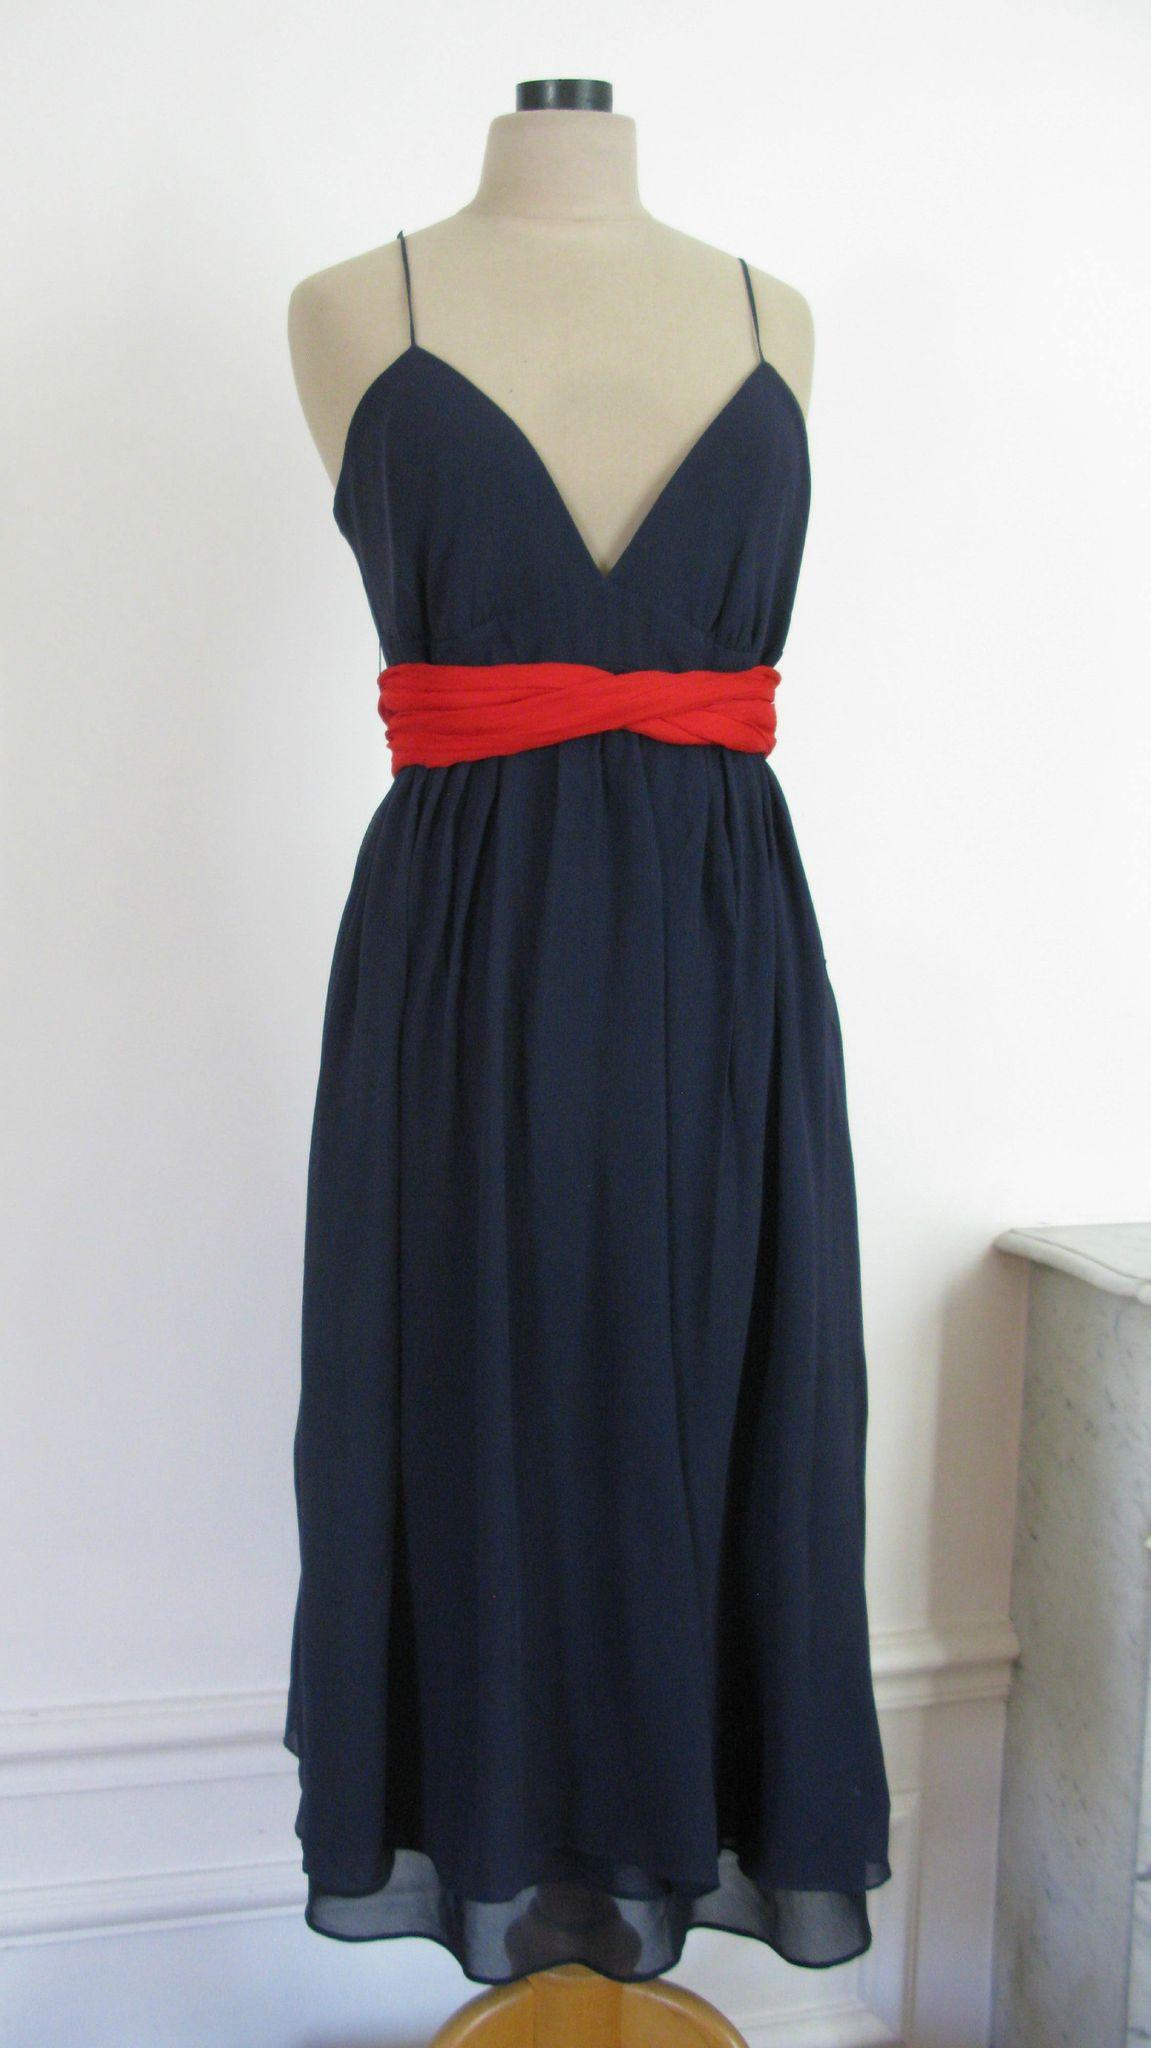 Robe bleu marine ceinture rouge